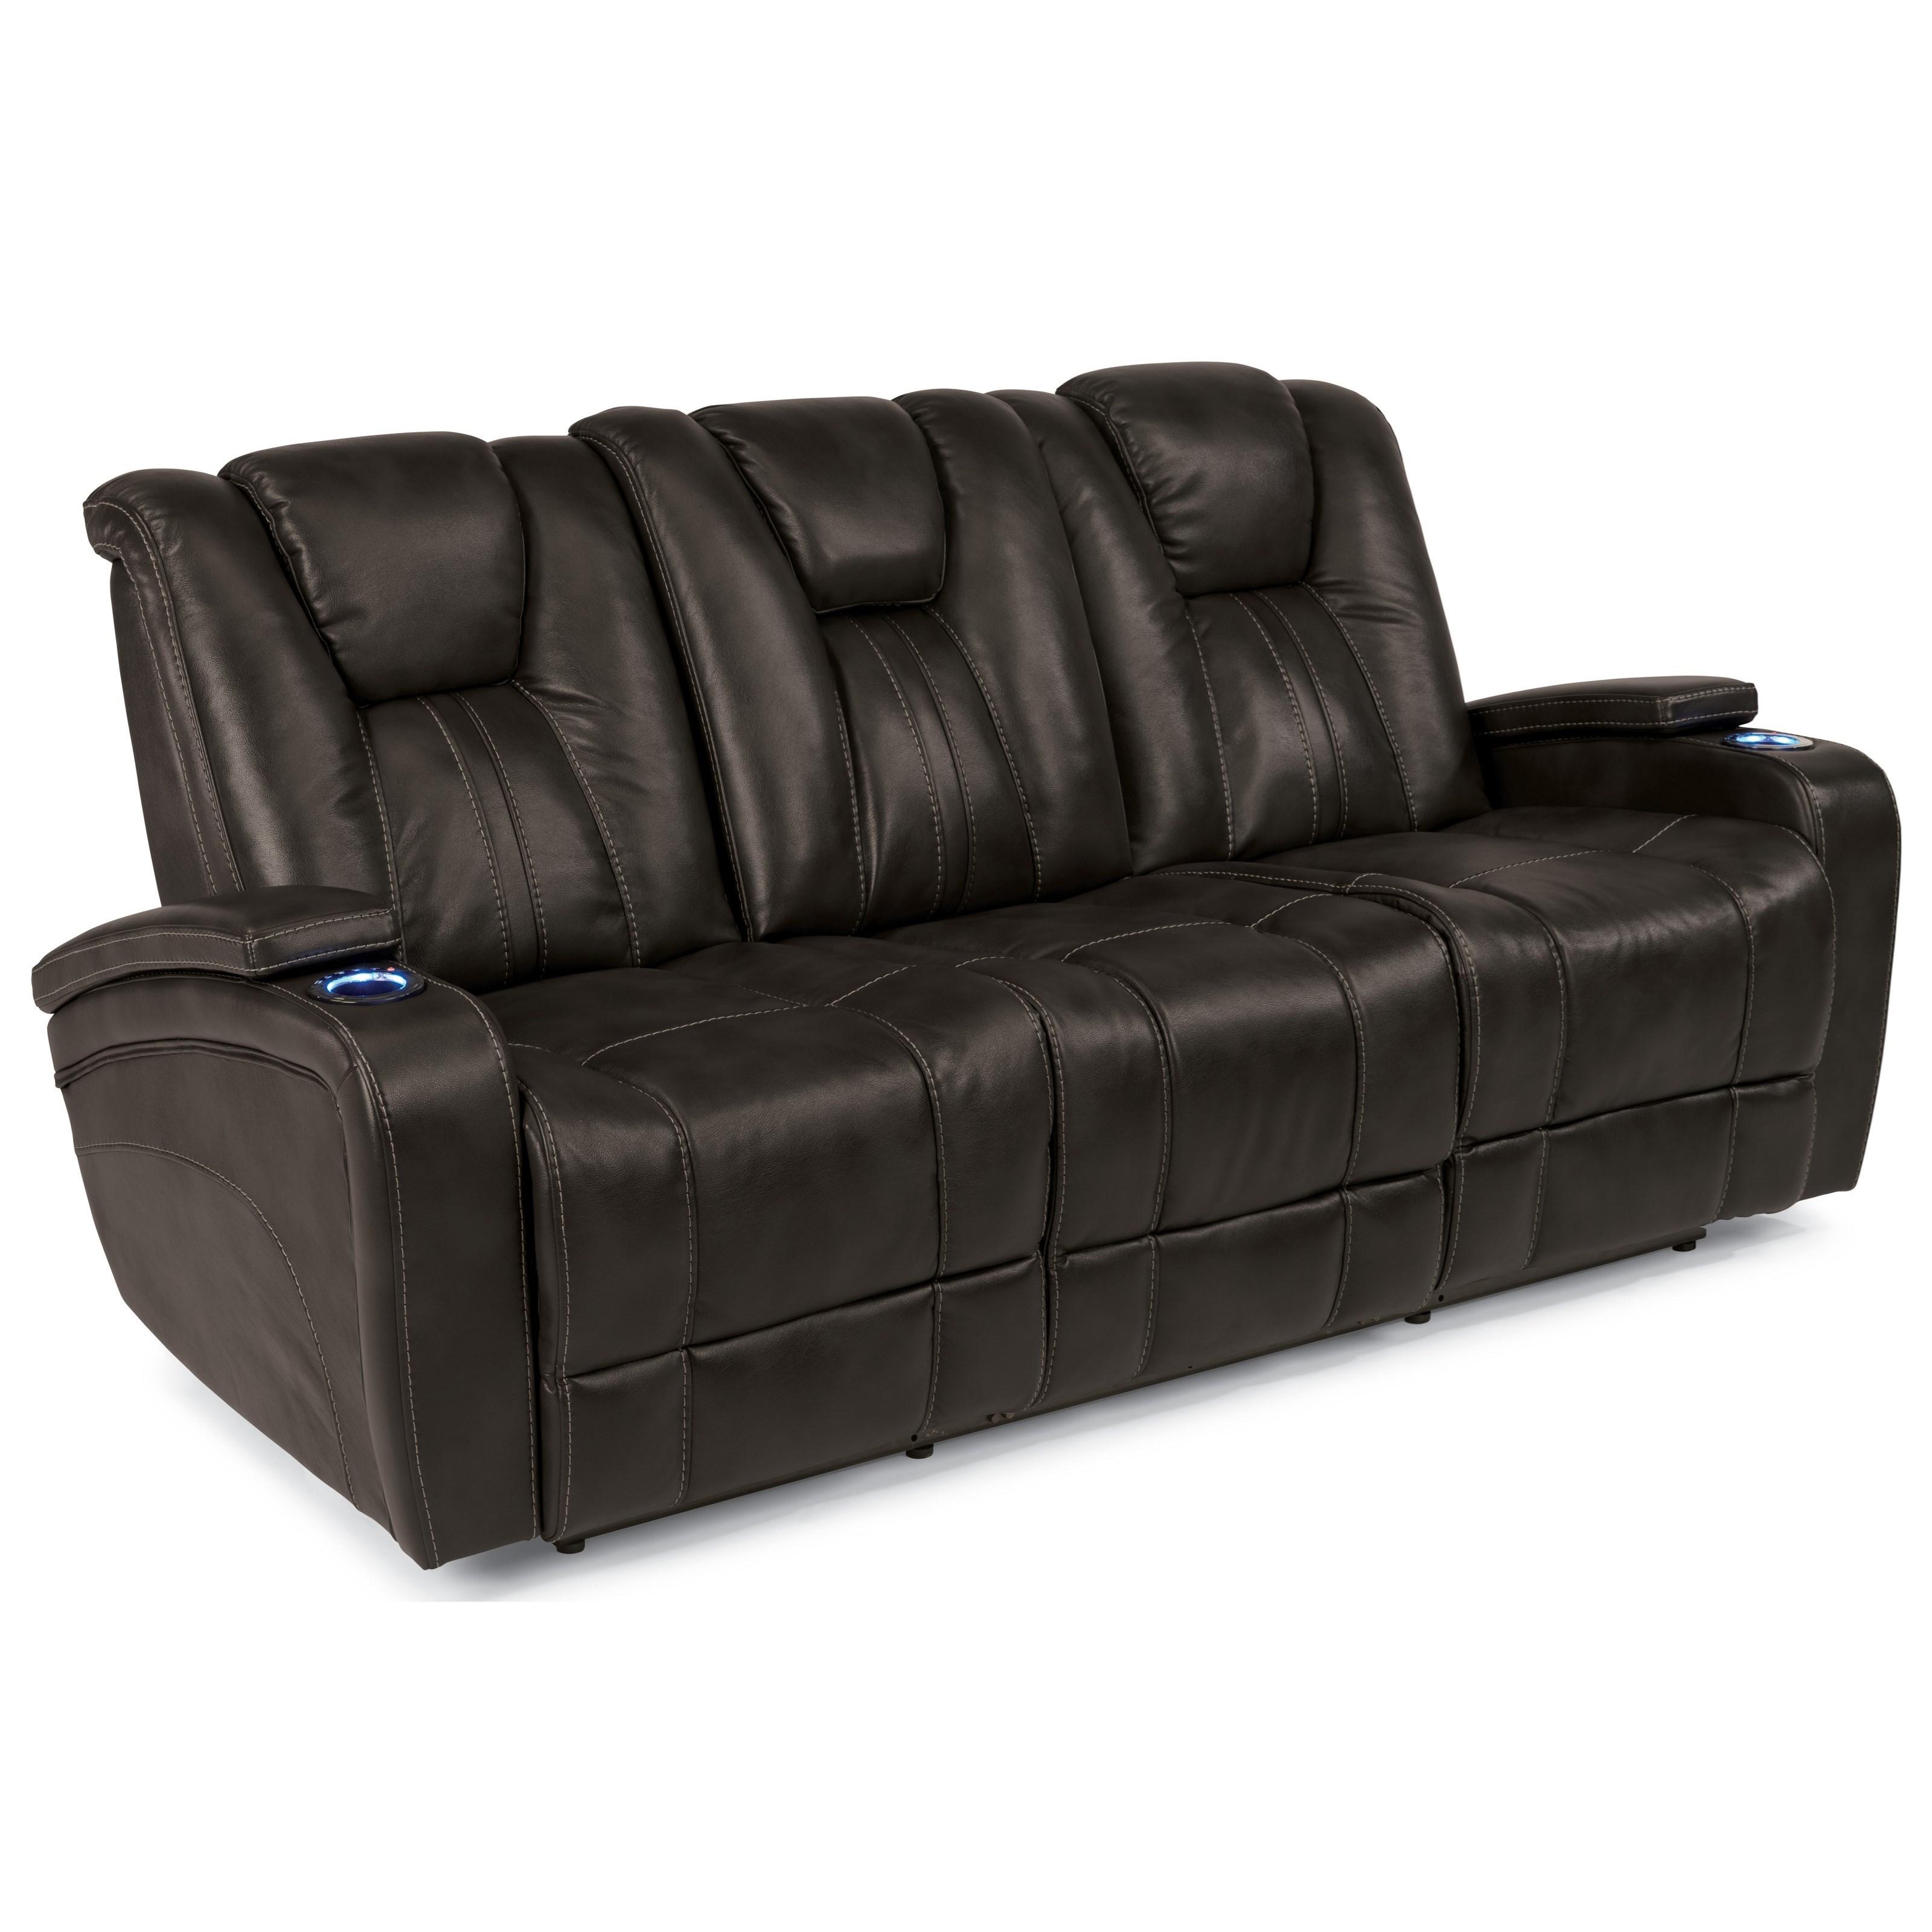 Flexsteel Electric Sofa: Electric Reclining Sofa Flexsteel Laudes Trinidad Adjule